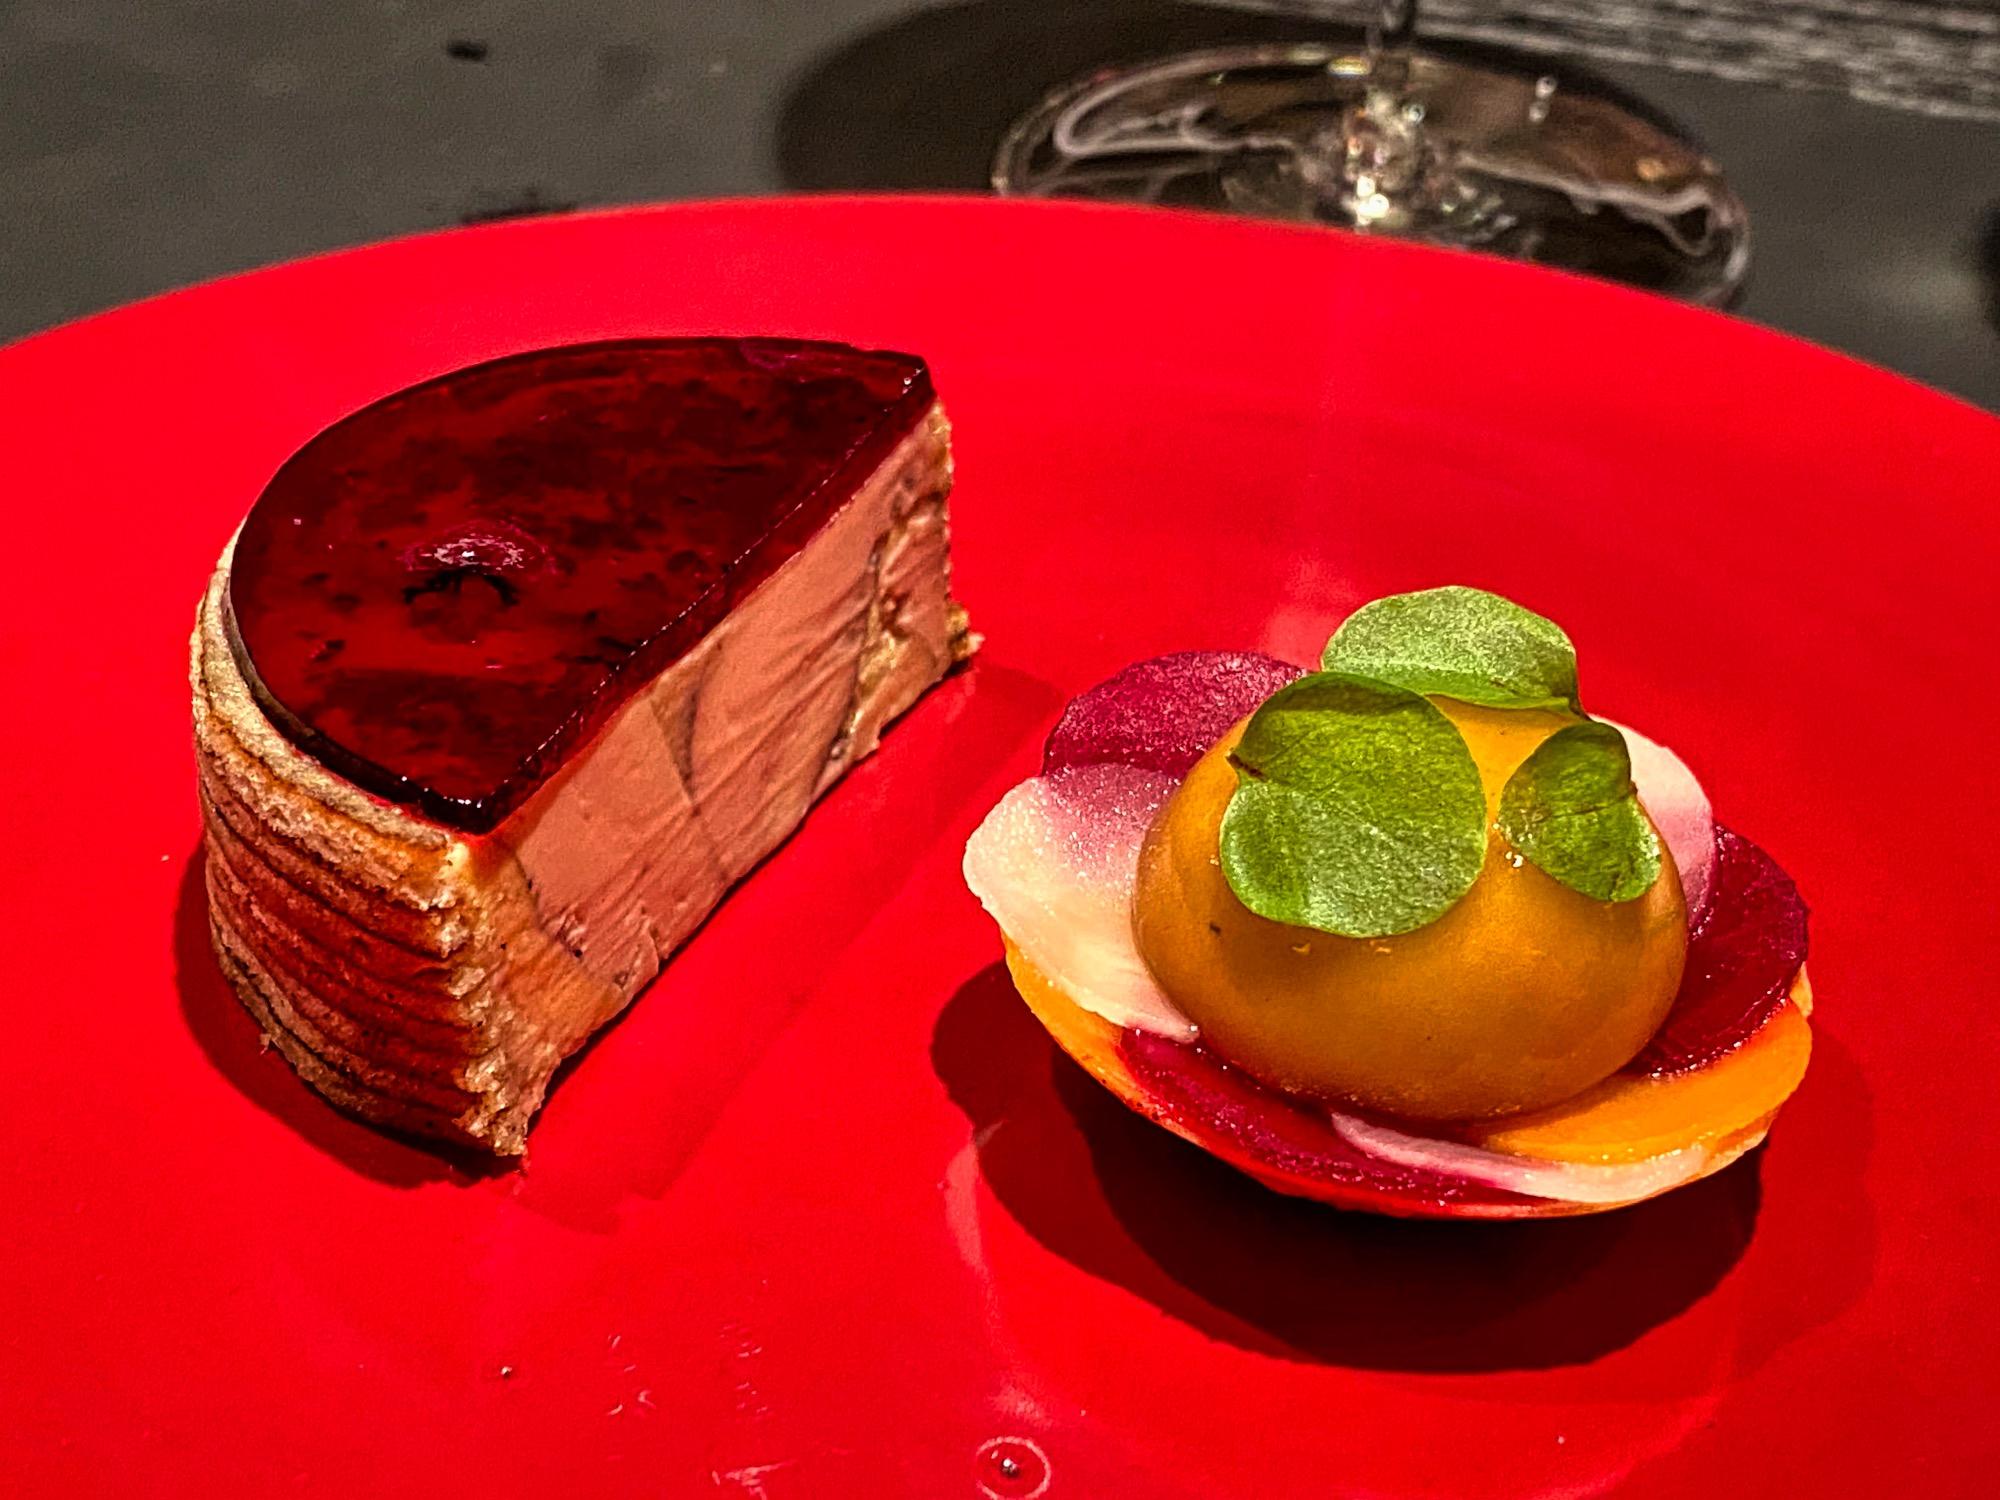 img_8531_rumour_racz_jeno_budapest_restaurant_jokuti_vilagevo_l_f.jpeg